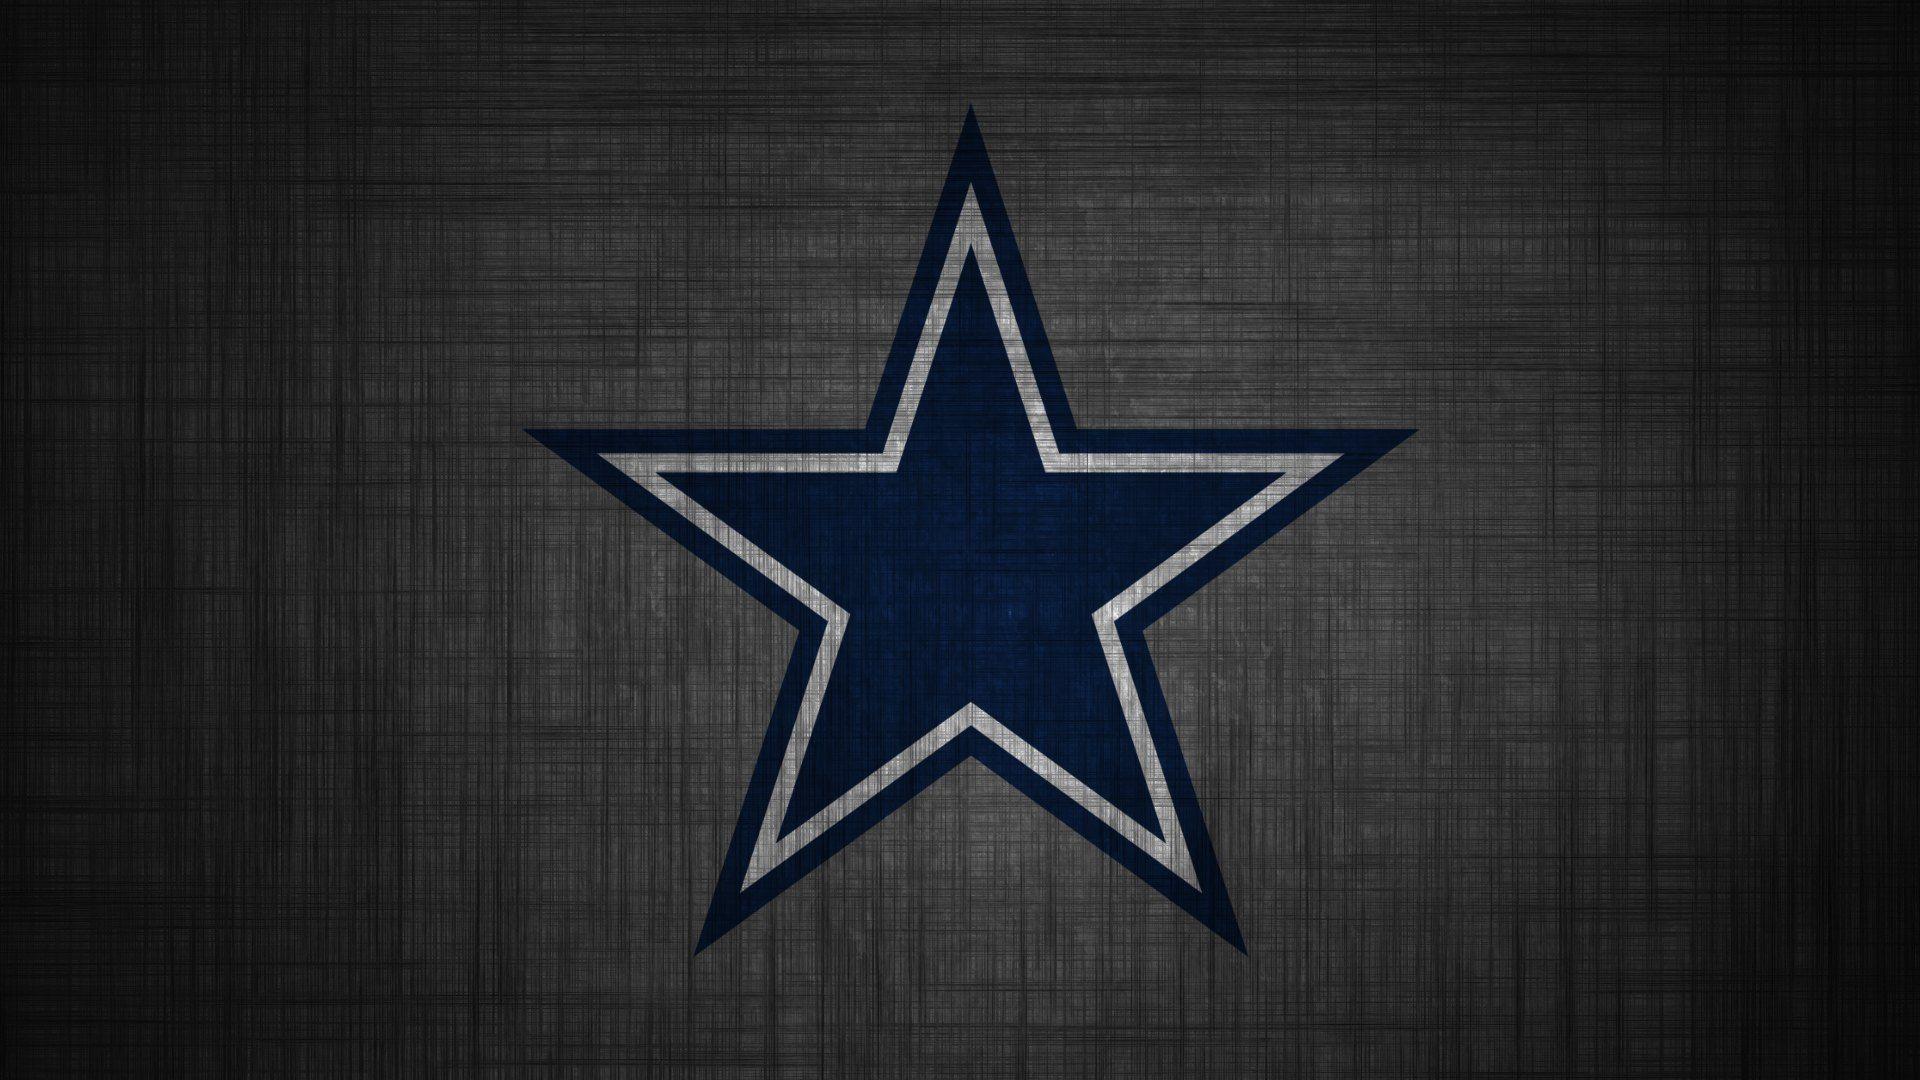 4683x3345 Dallas Cowboys Gloves Wallpaper 52895 4683x3345 px ~ HDWallSource.com